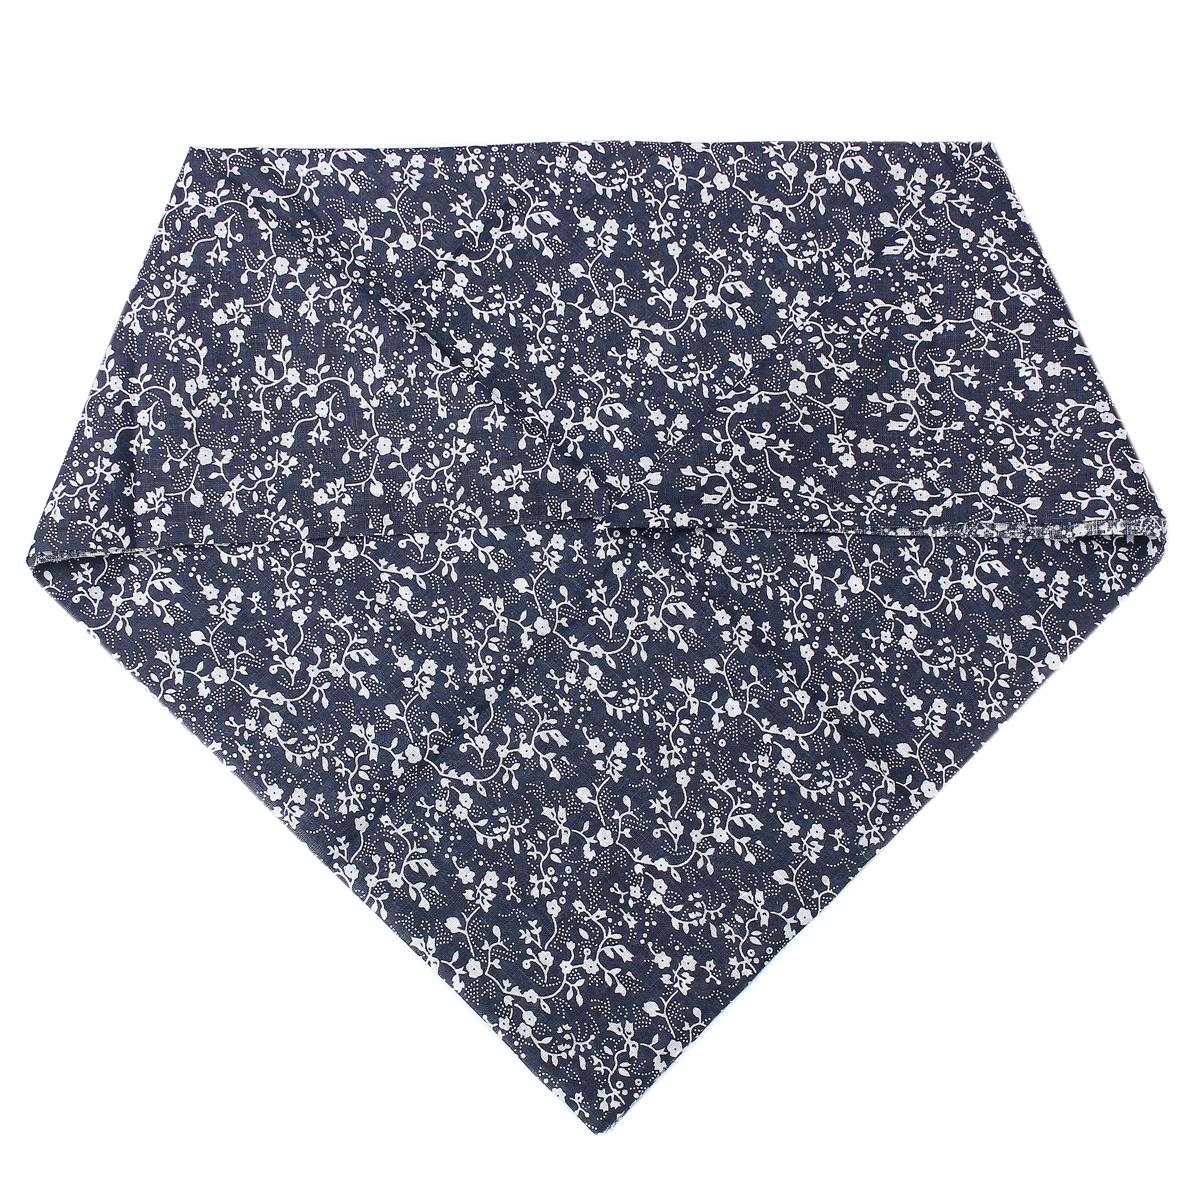 KINGSO 7PCS Cotton Fabric